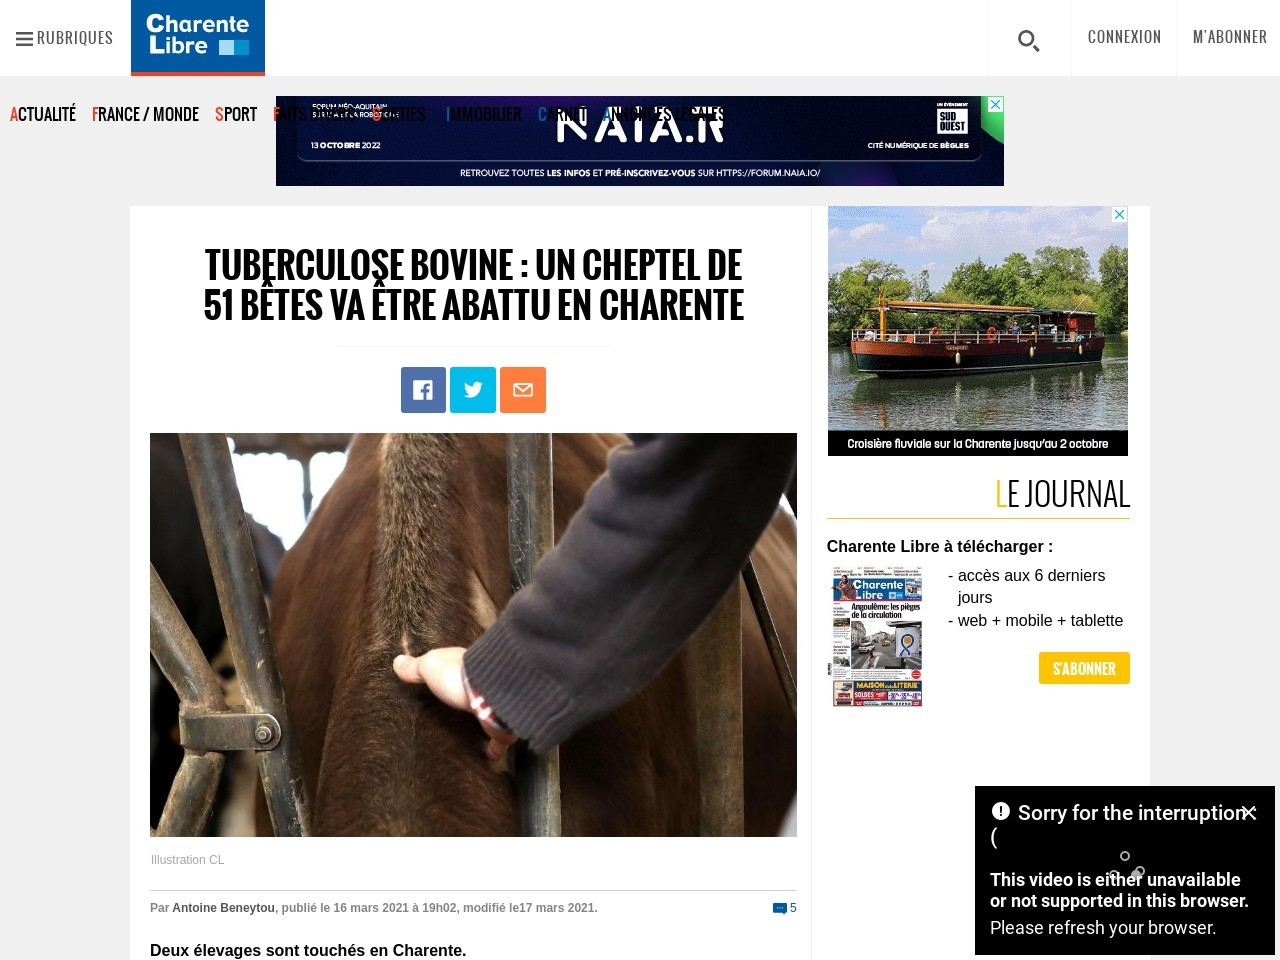 Tuberculose bovine: un cheptel de 51bêtes va être abattu en Charente